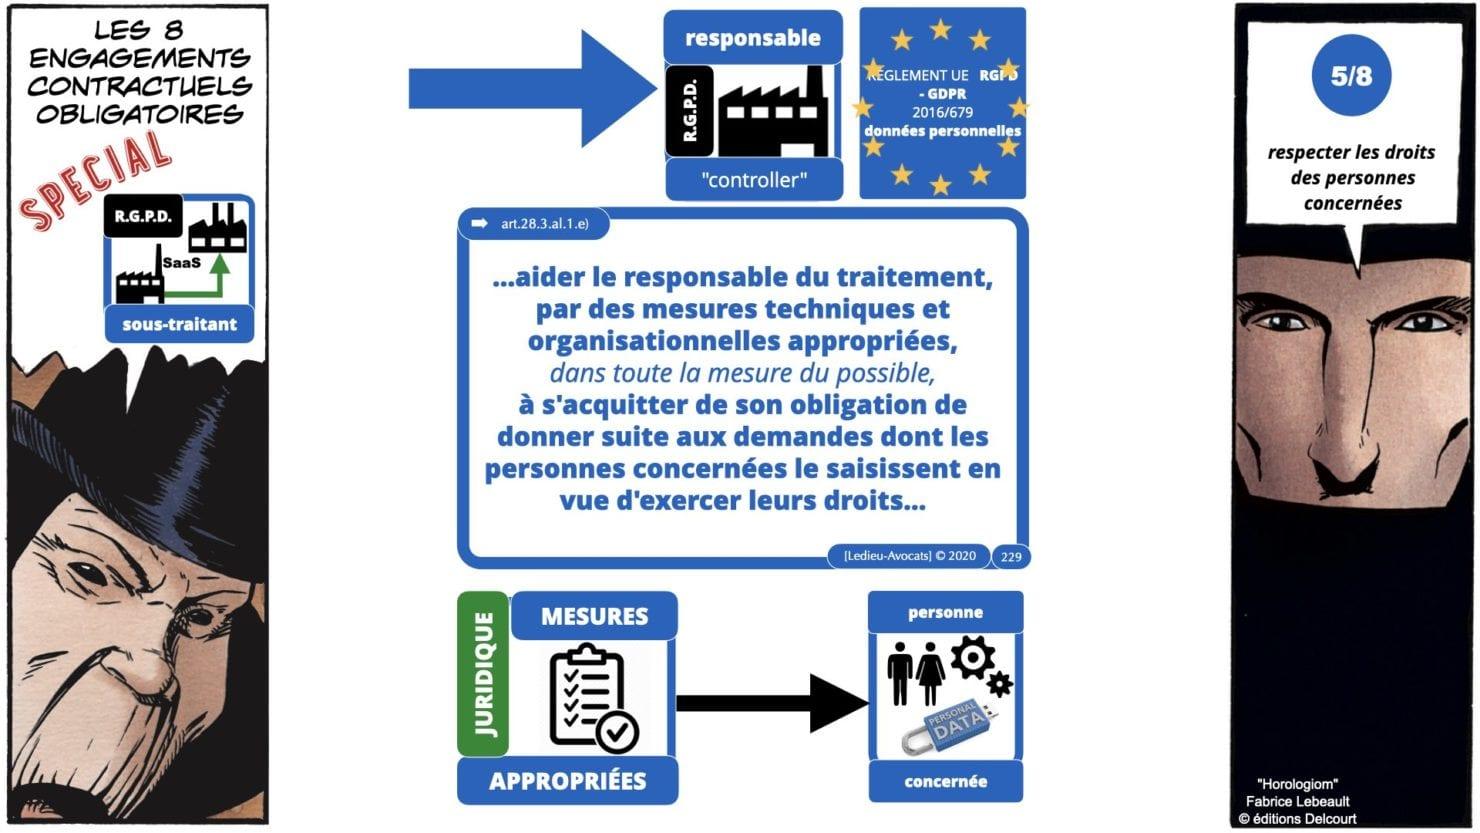 RGPD e-Privacy principes actualité jurisprudence ©Ledieu-Avocats 25-06-2021.229